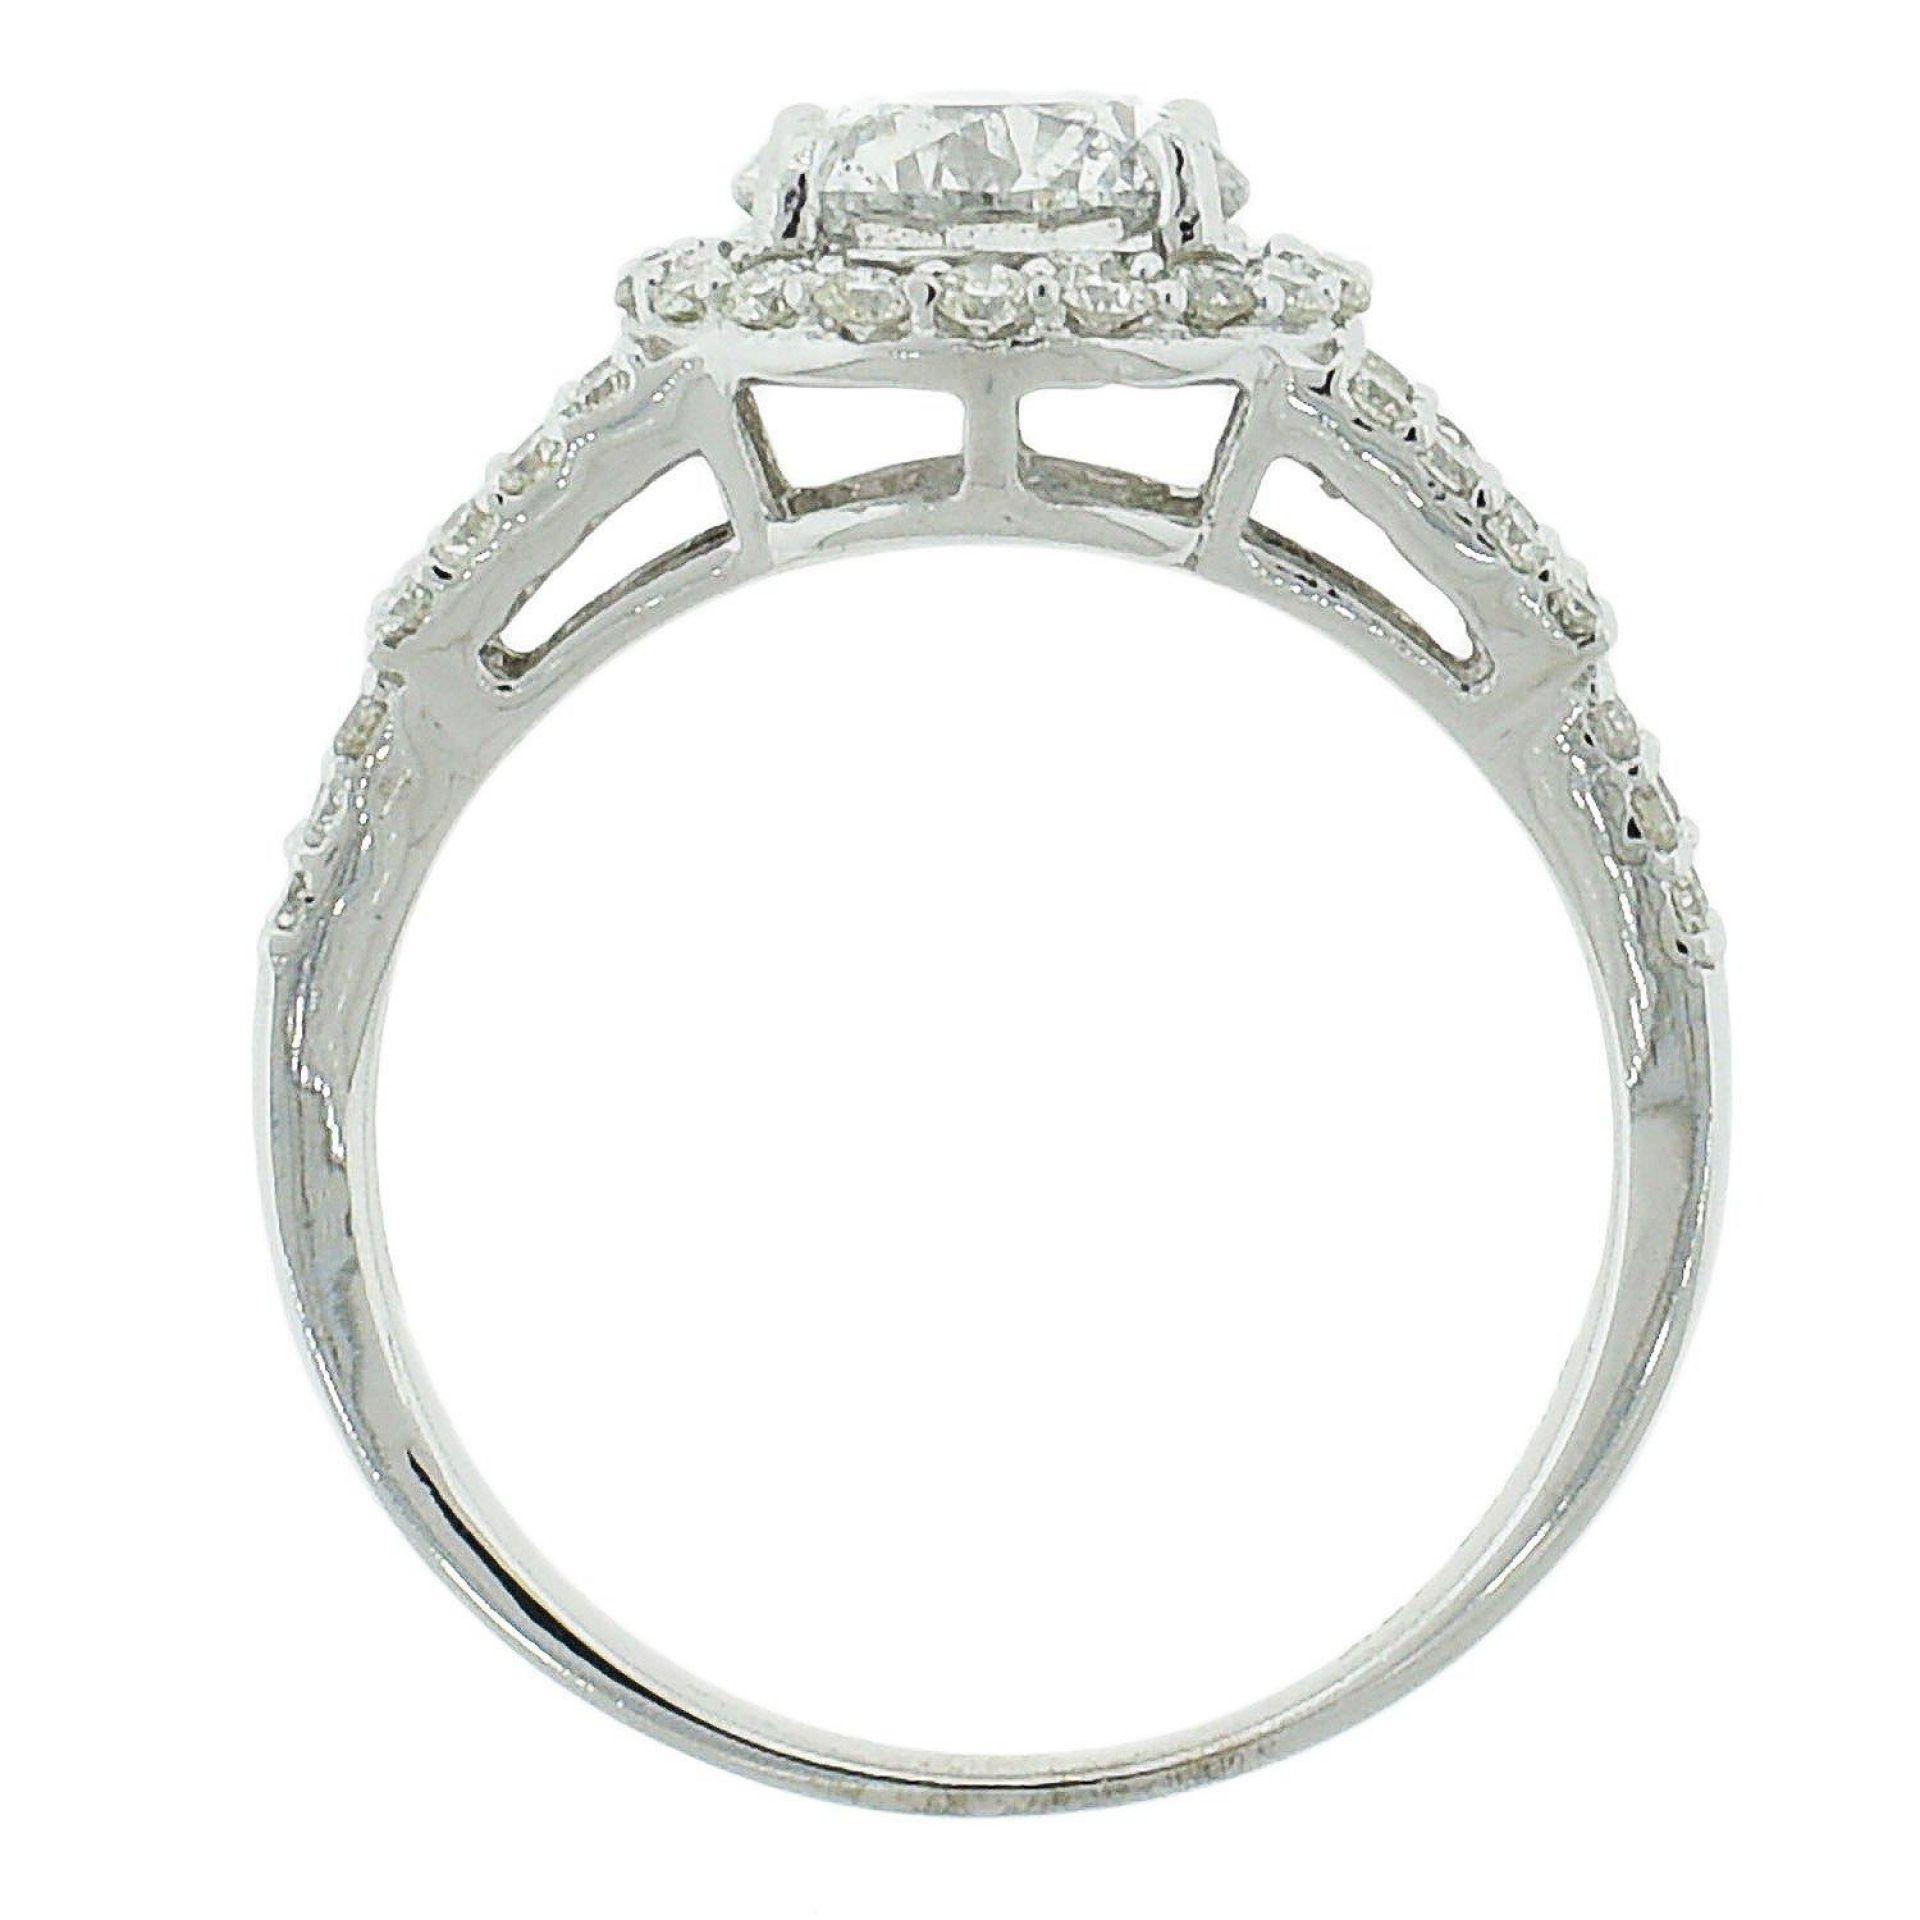 1.49ct E COLOR CENTER Diamond Ring (2.16ctw Diamonds) EGL USA CERTIFIED